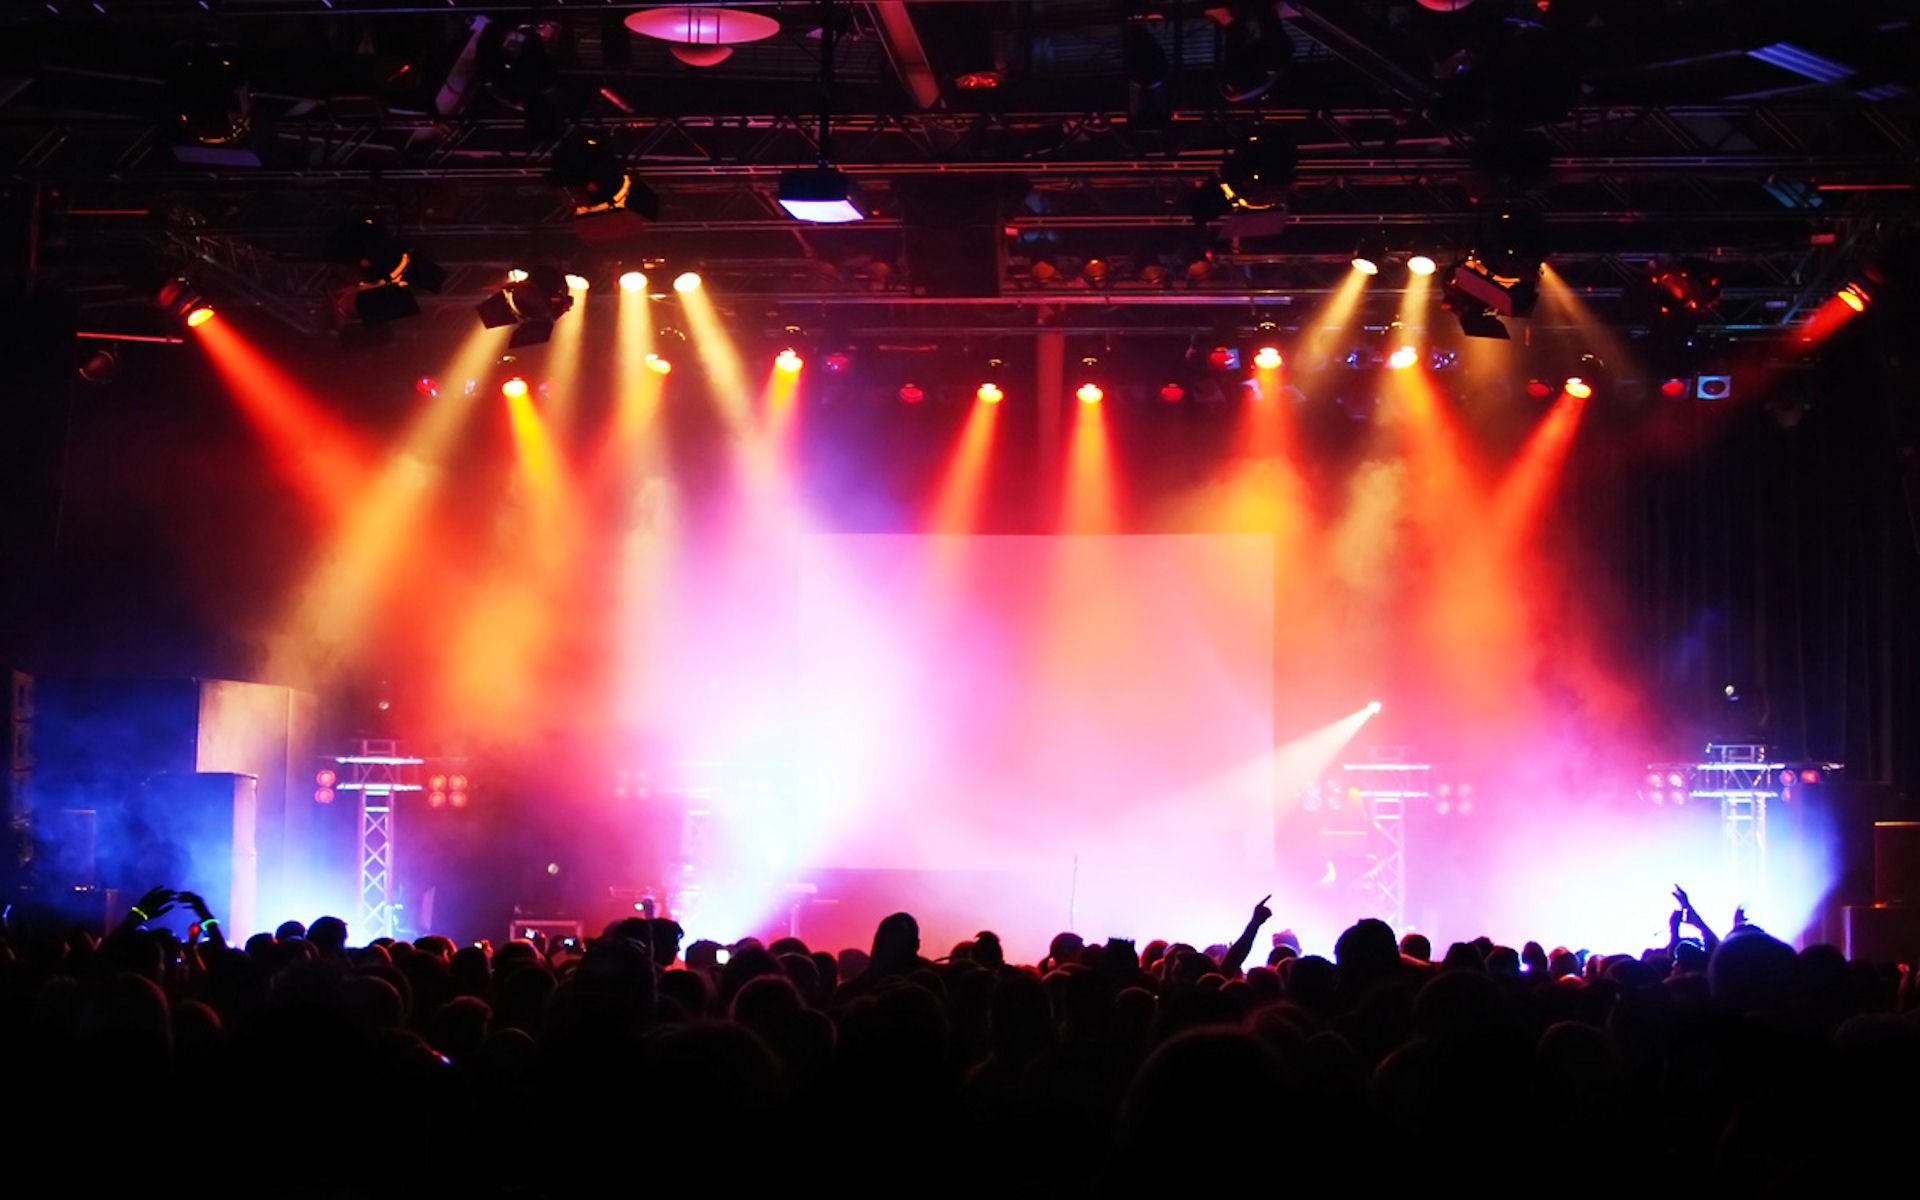 rock concert stage wallpaper